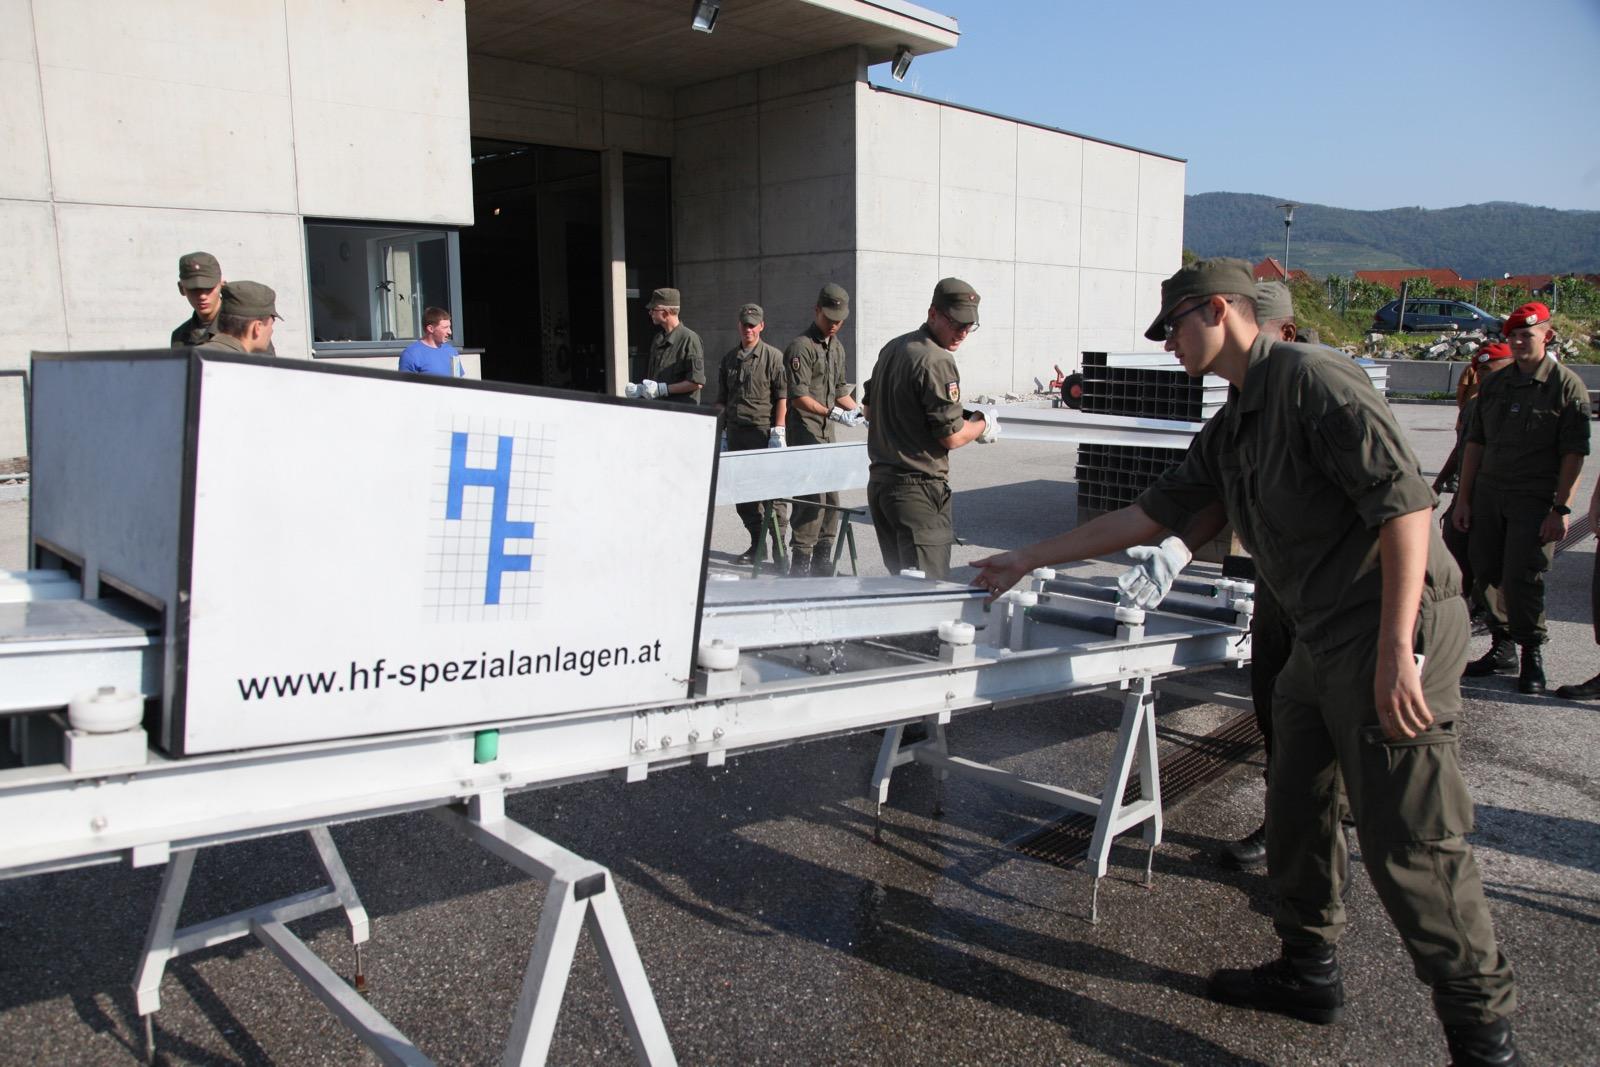 2018_09_06_Katastrophenhilfe_3Kompanie_jochling_weissenkirchen - 10